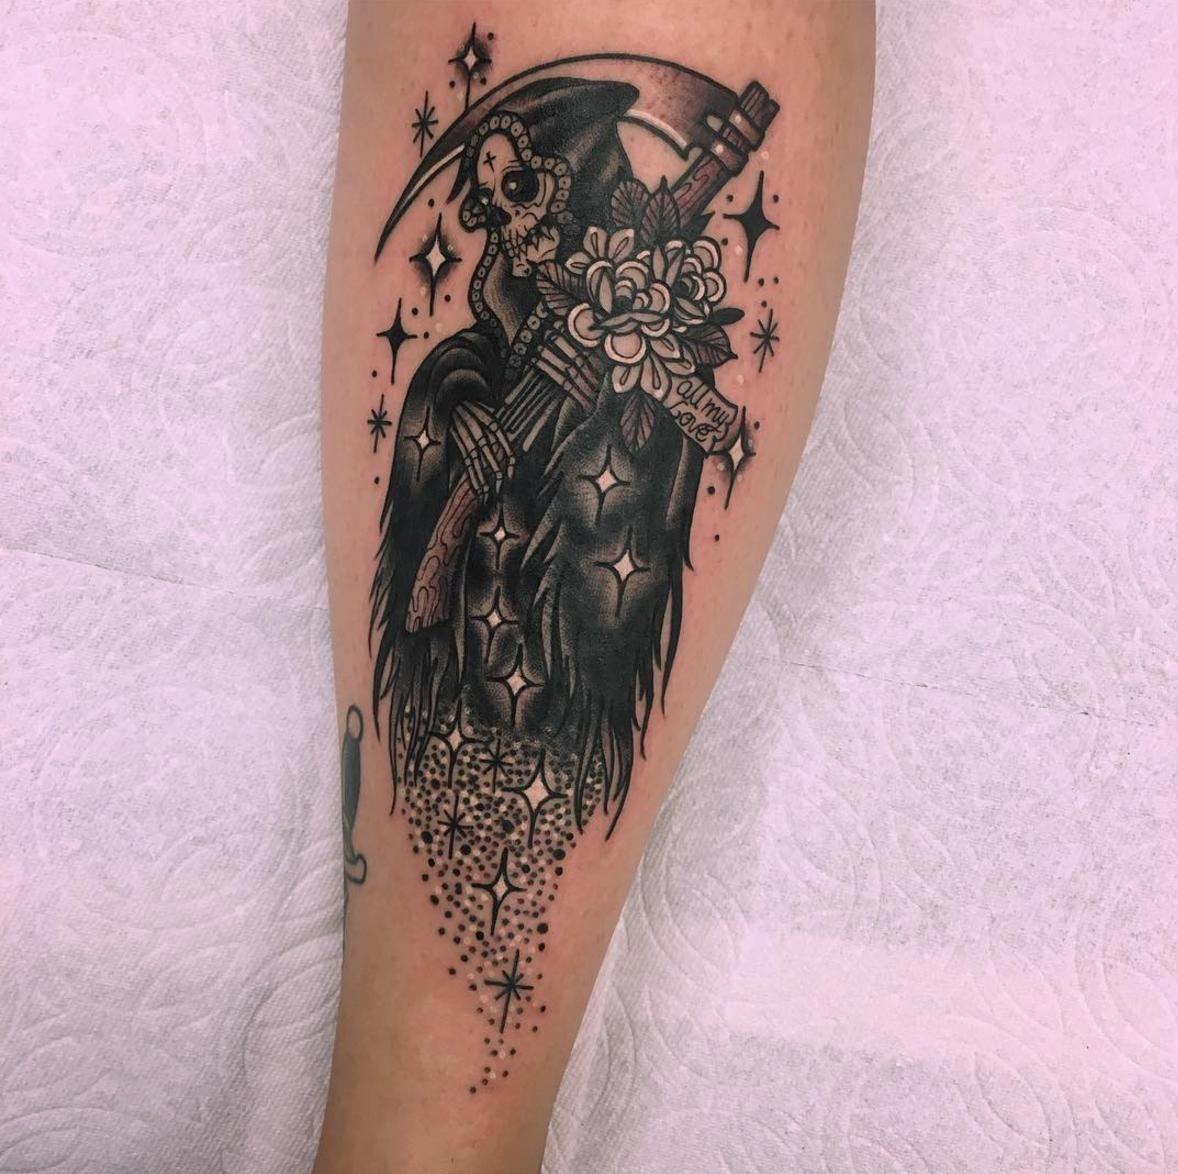 Catalogo Tatuaje Japones Significado (129)